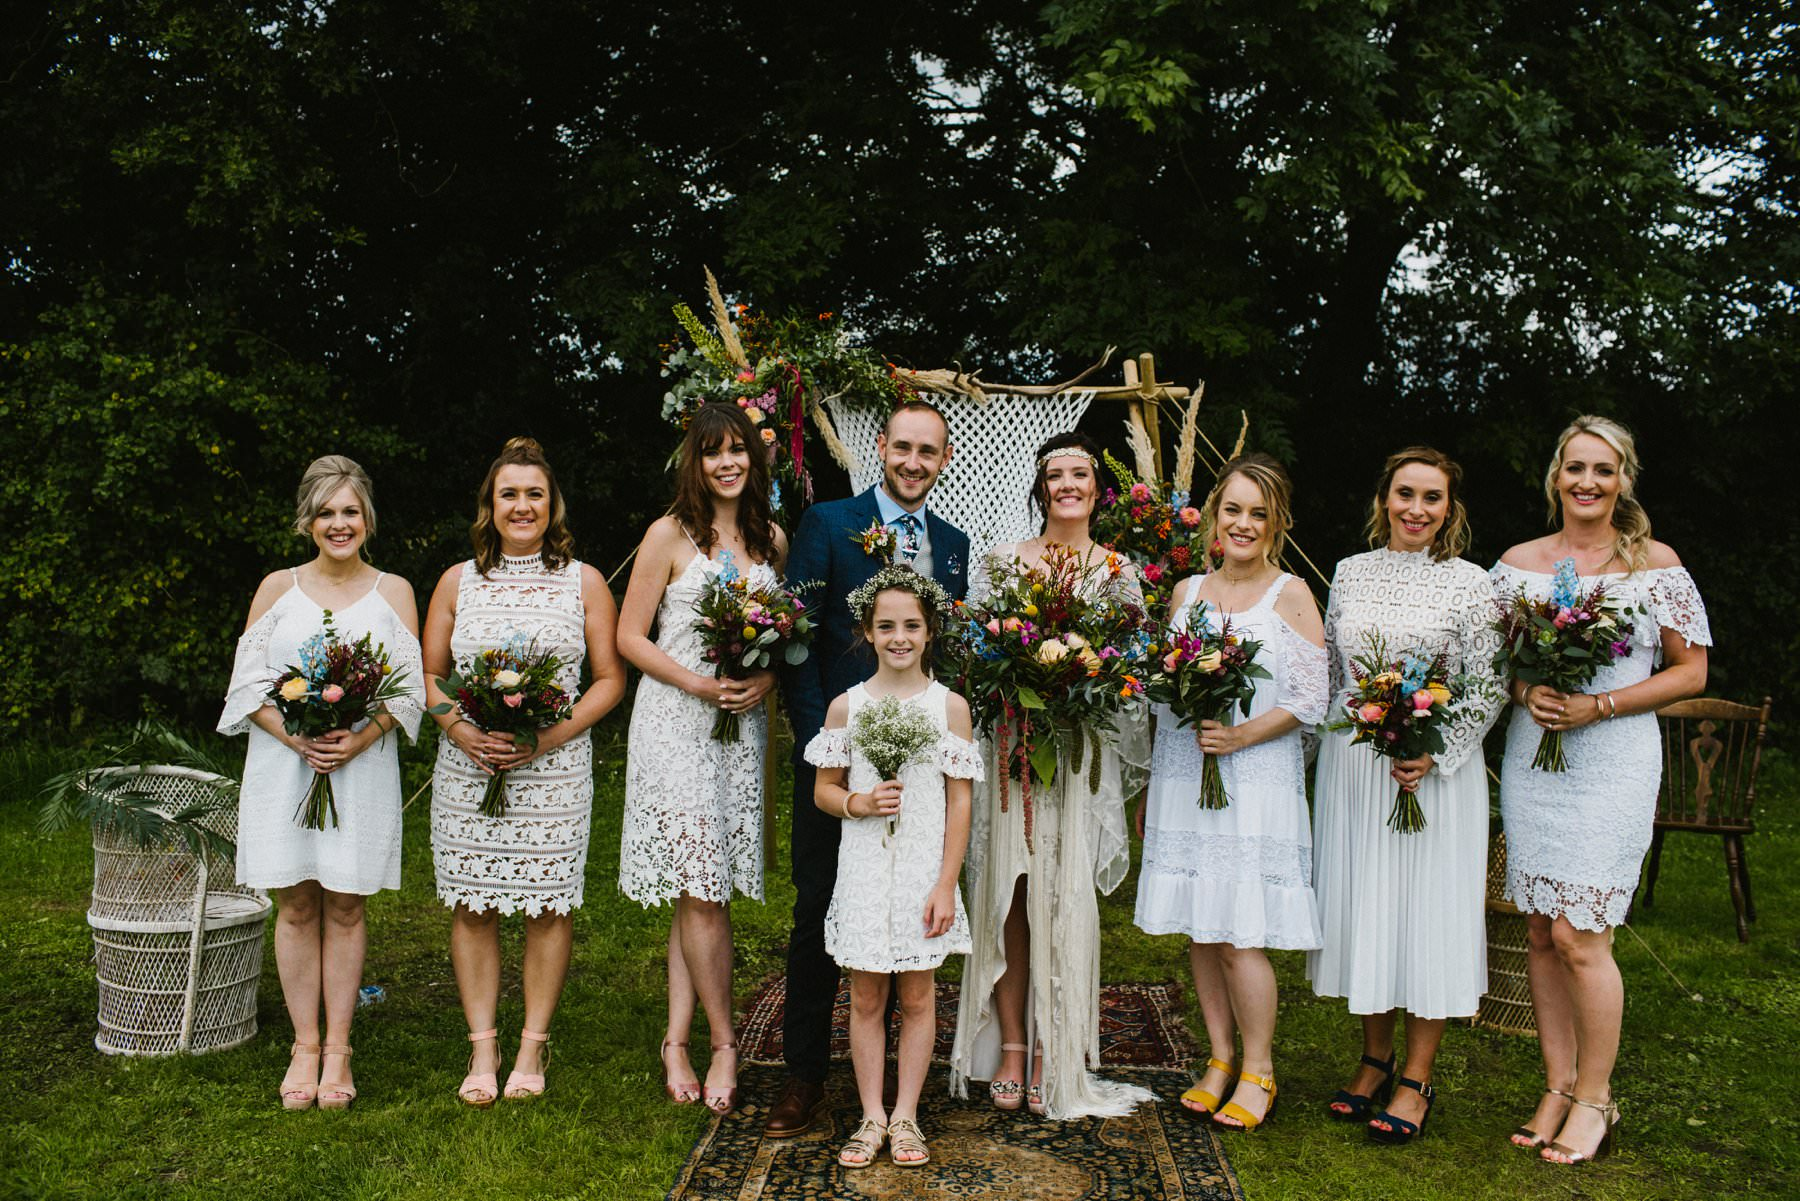 boho bride and bridesmaids outdoor wedding photography